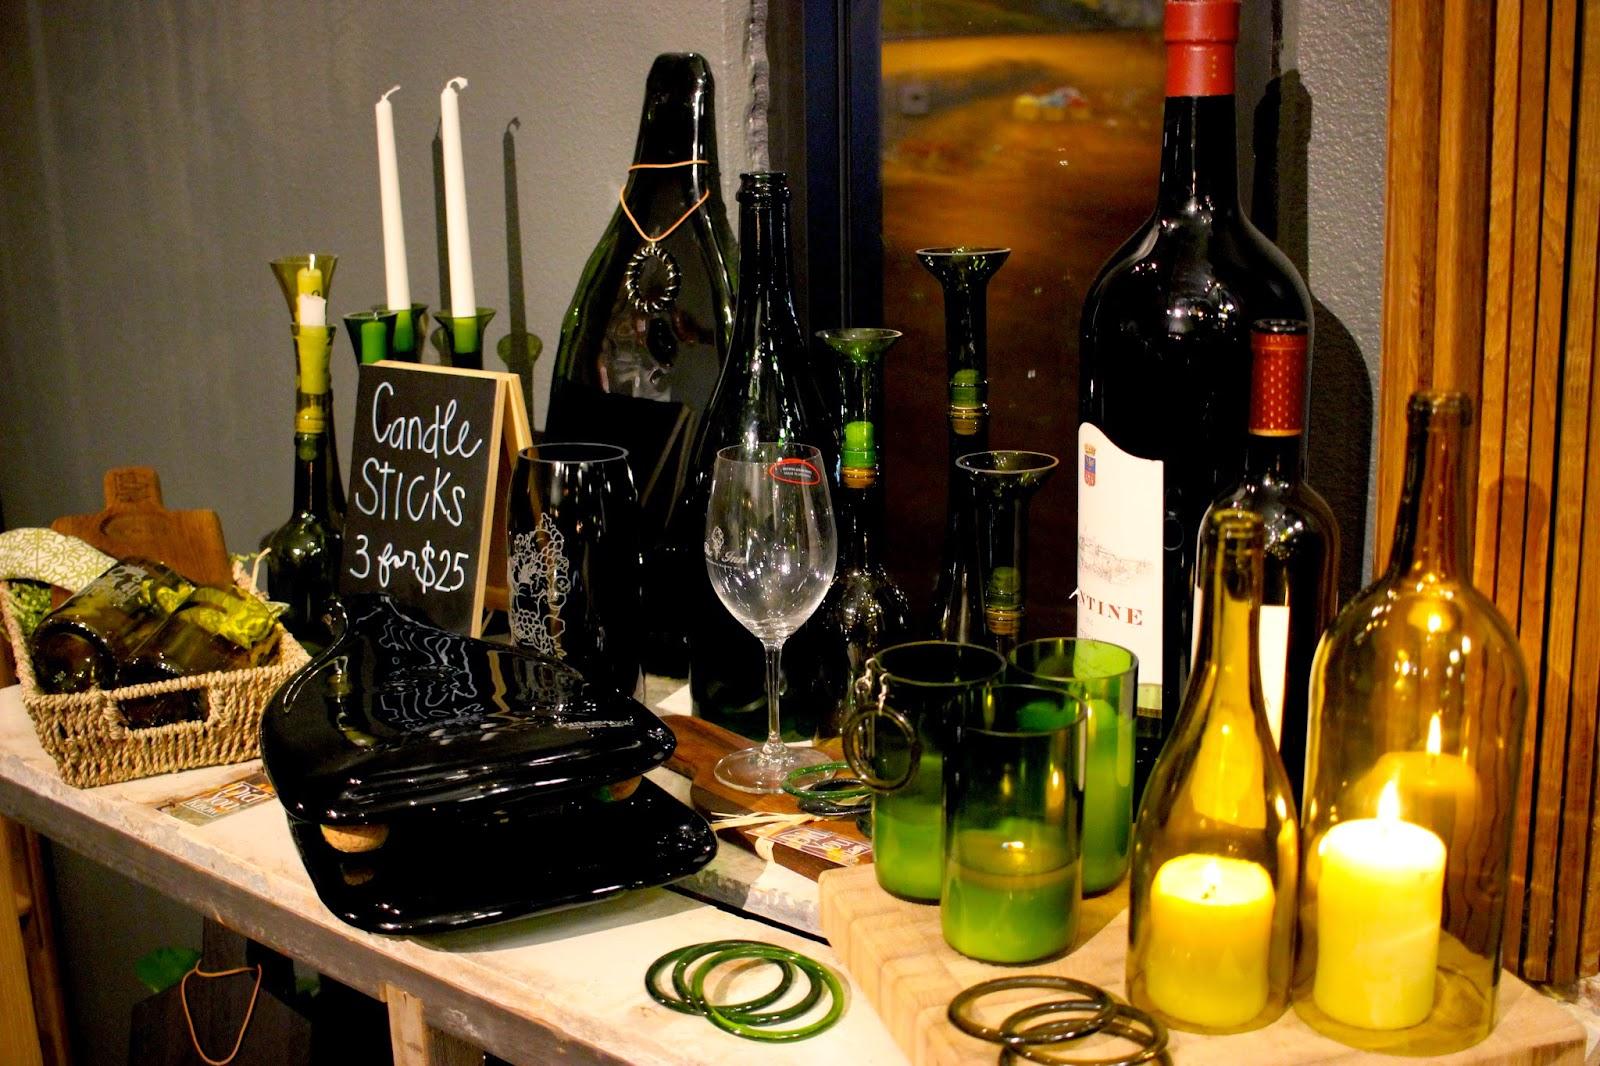 Bottles & Wood